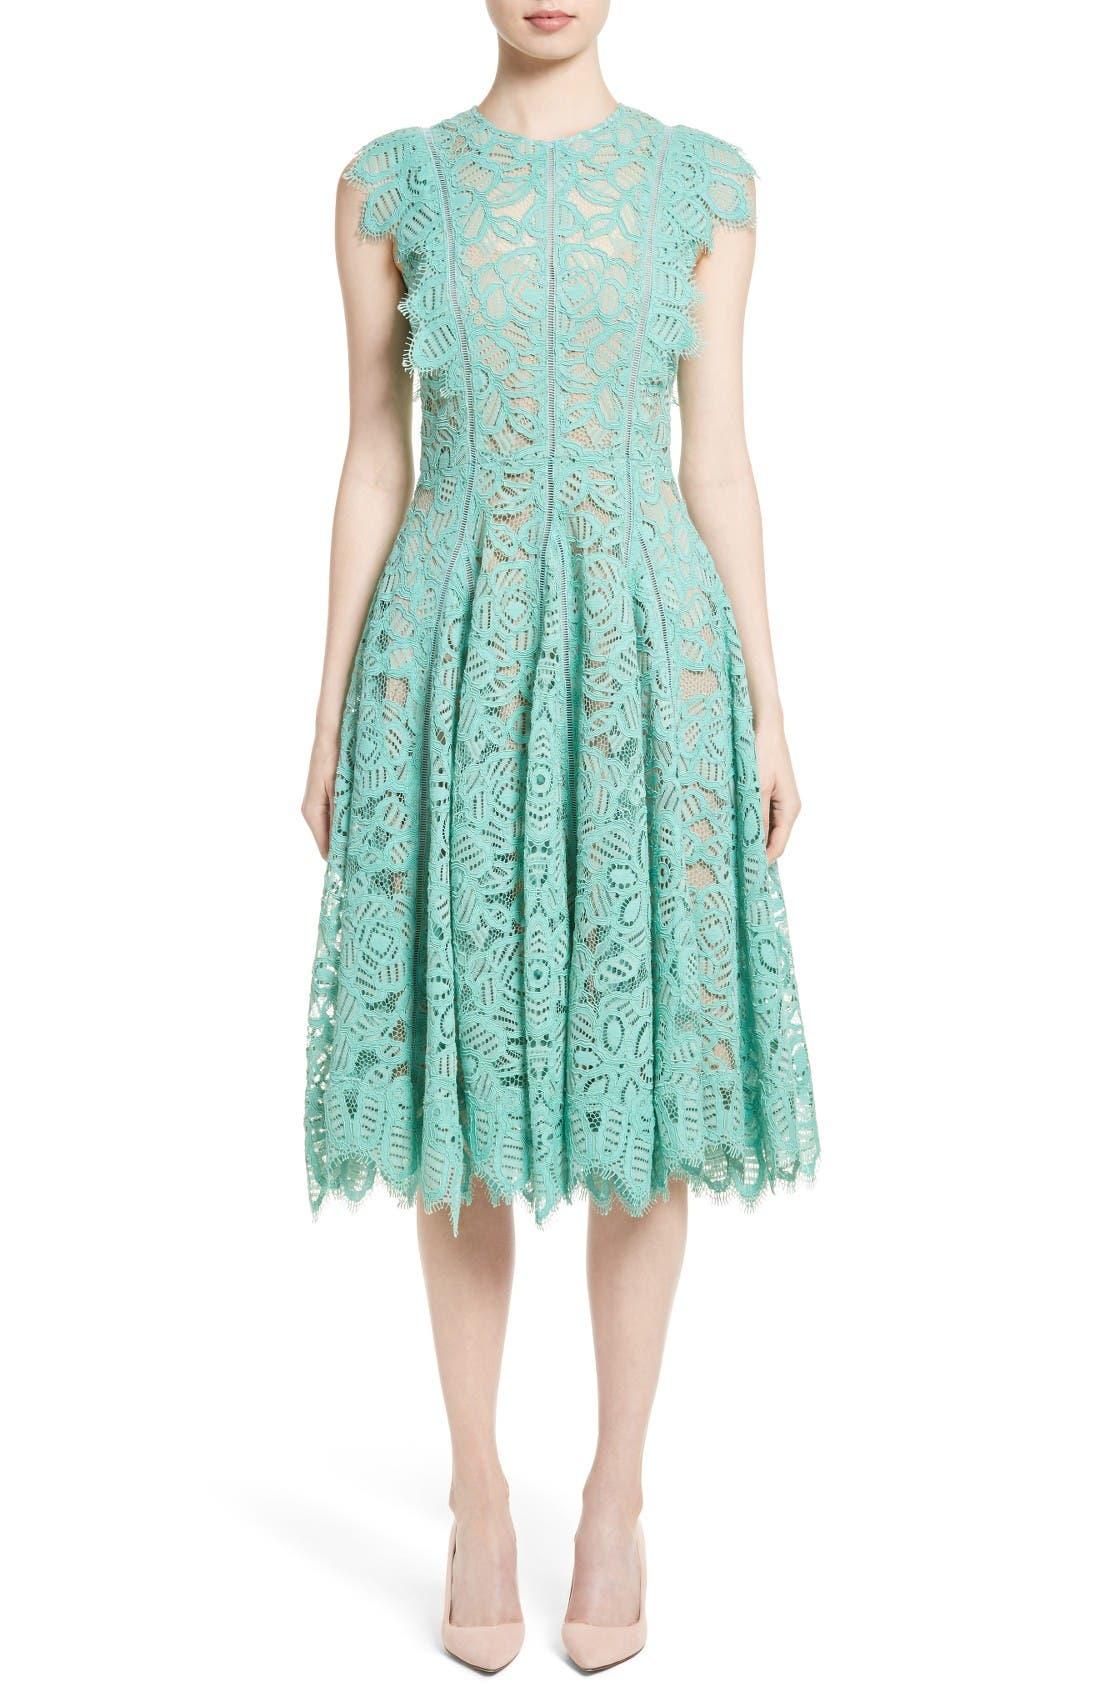 Alternate Image 1 Selected - Lela Rose Lace Fit & Flare Dress